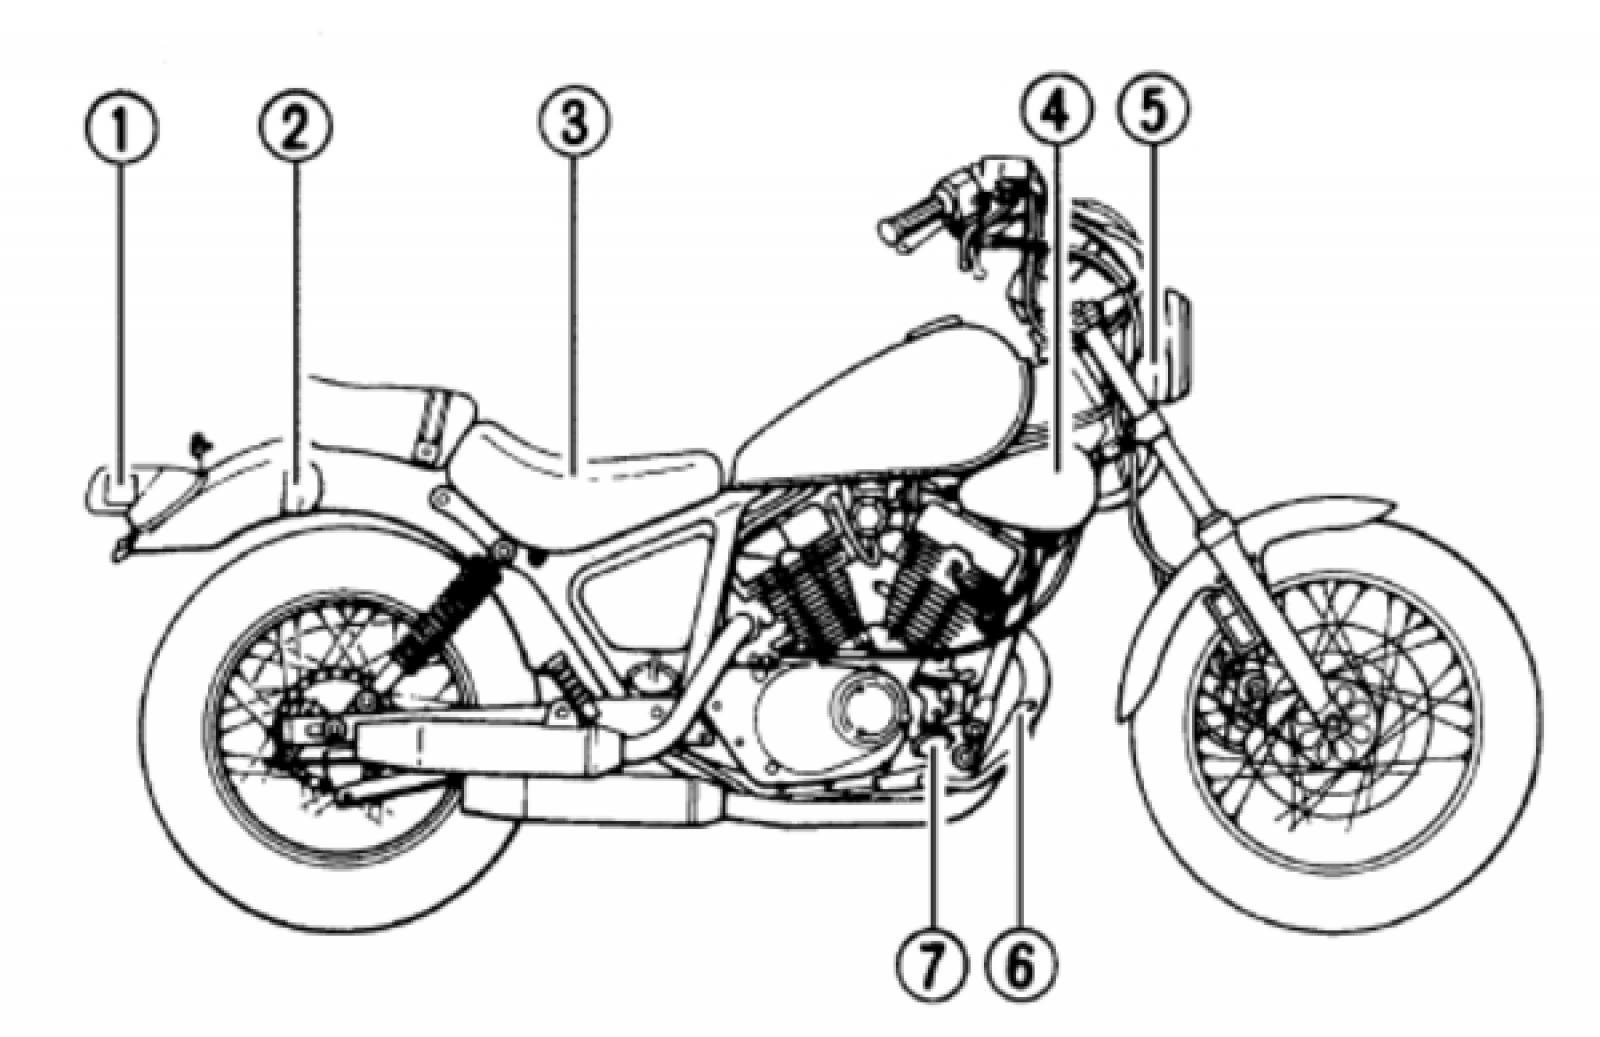 2007 yamaha virago 250 wiring diagram hart 2000 v twin 6 wire 37